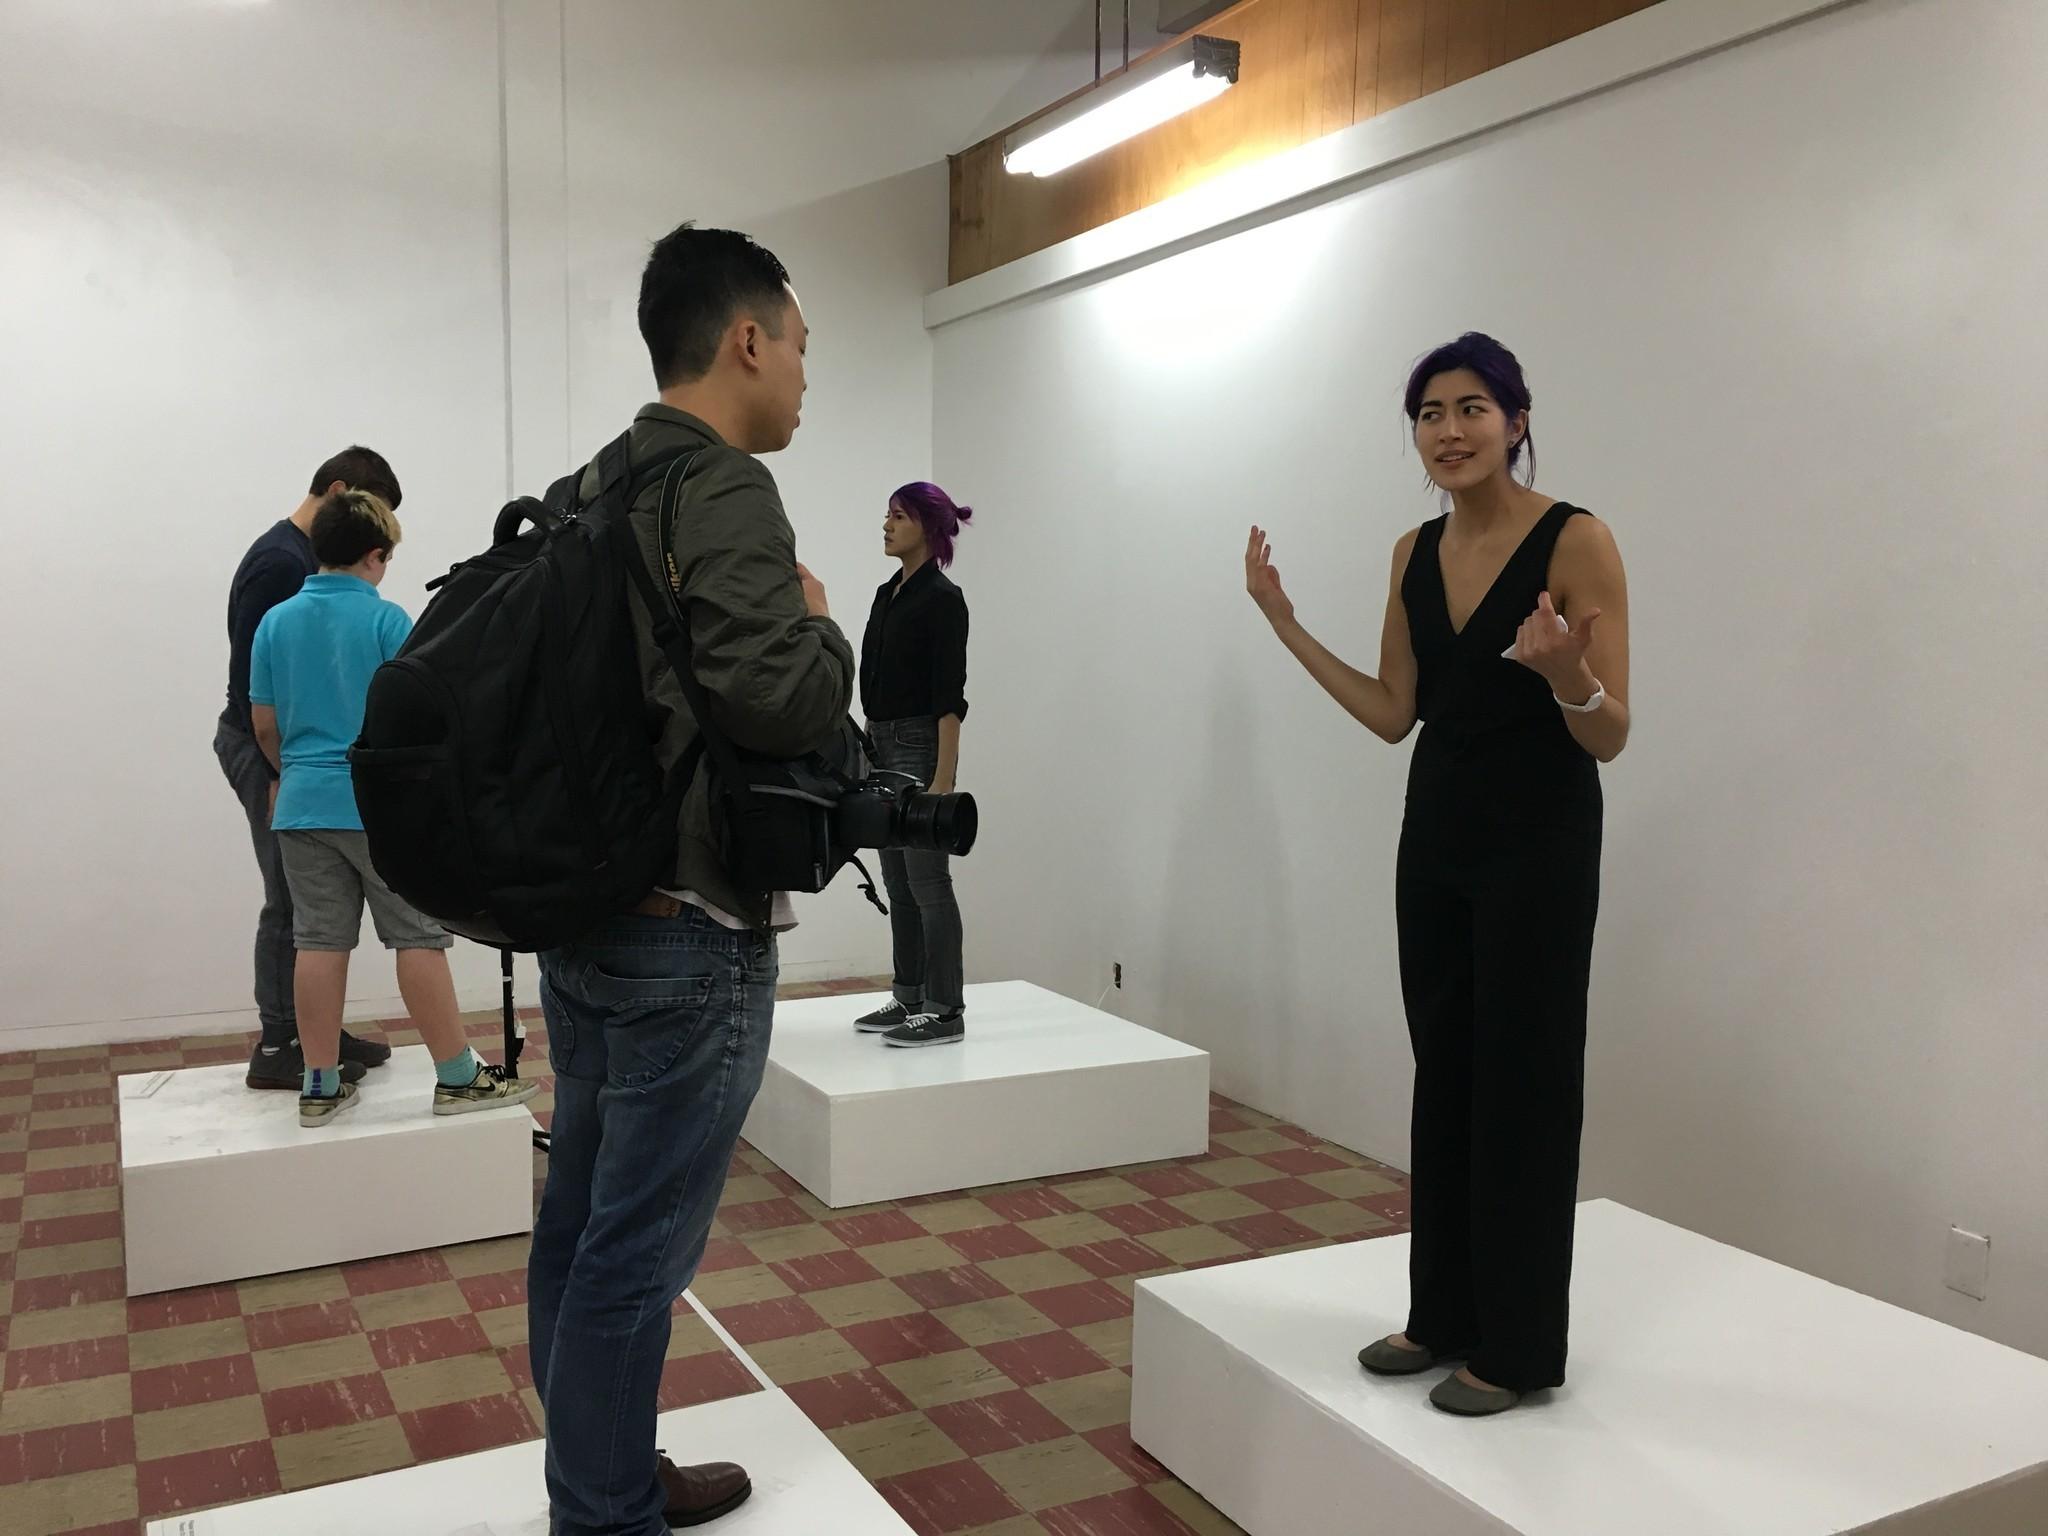 Emma Mattress Review >> Moving beyond 'Mattress Girl': Artist Emma Sulkowicz pushes the conversation forward - LA Times